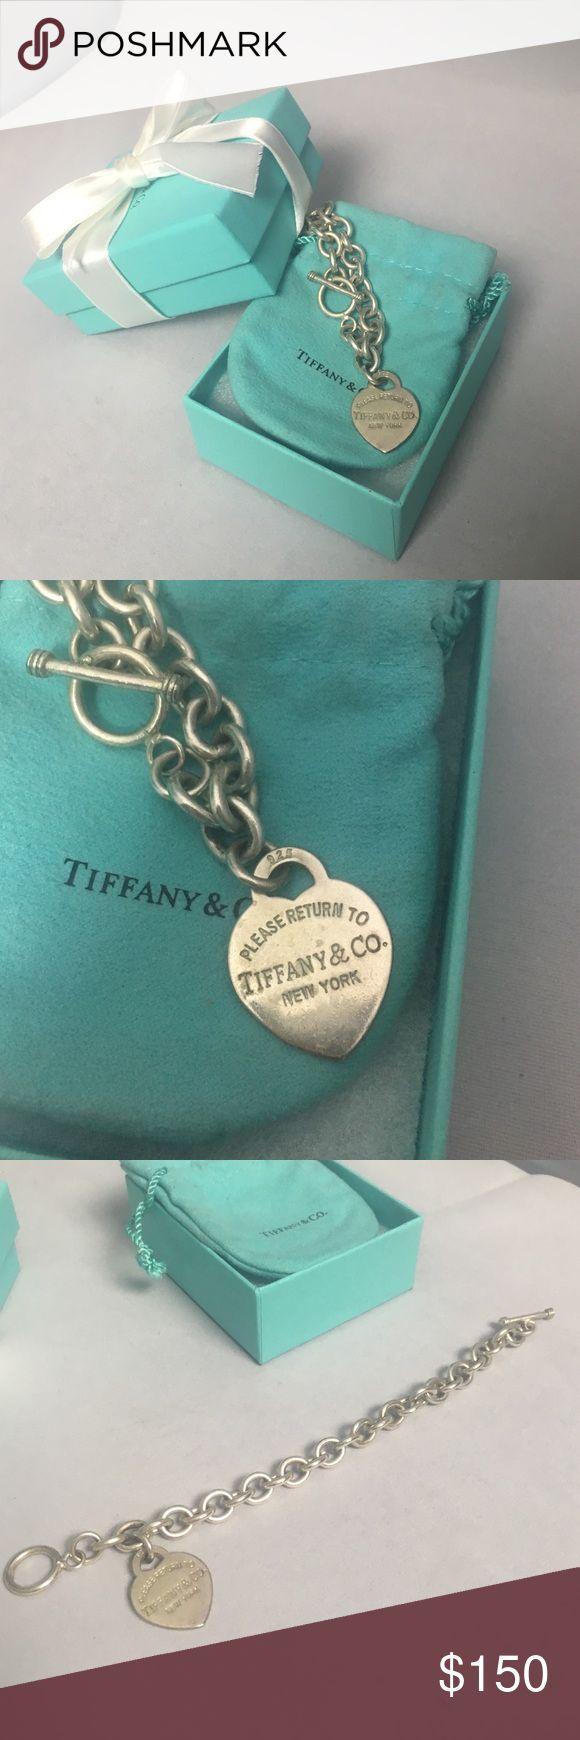 Heartshaped Tiffany Charm Bracelet! Authentic Stirling Silver Tiffany And  Co Charm Bracelet